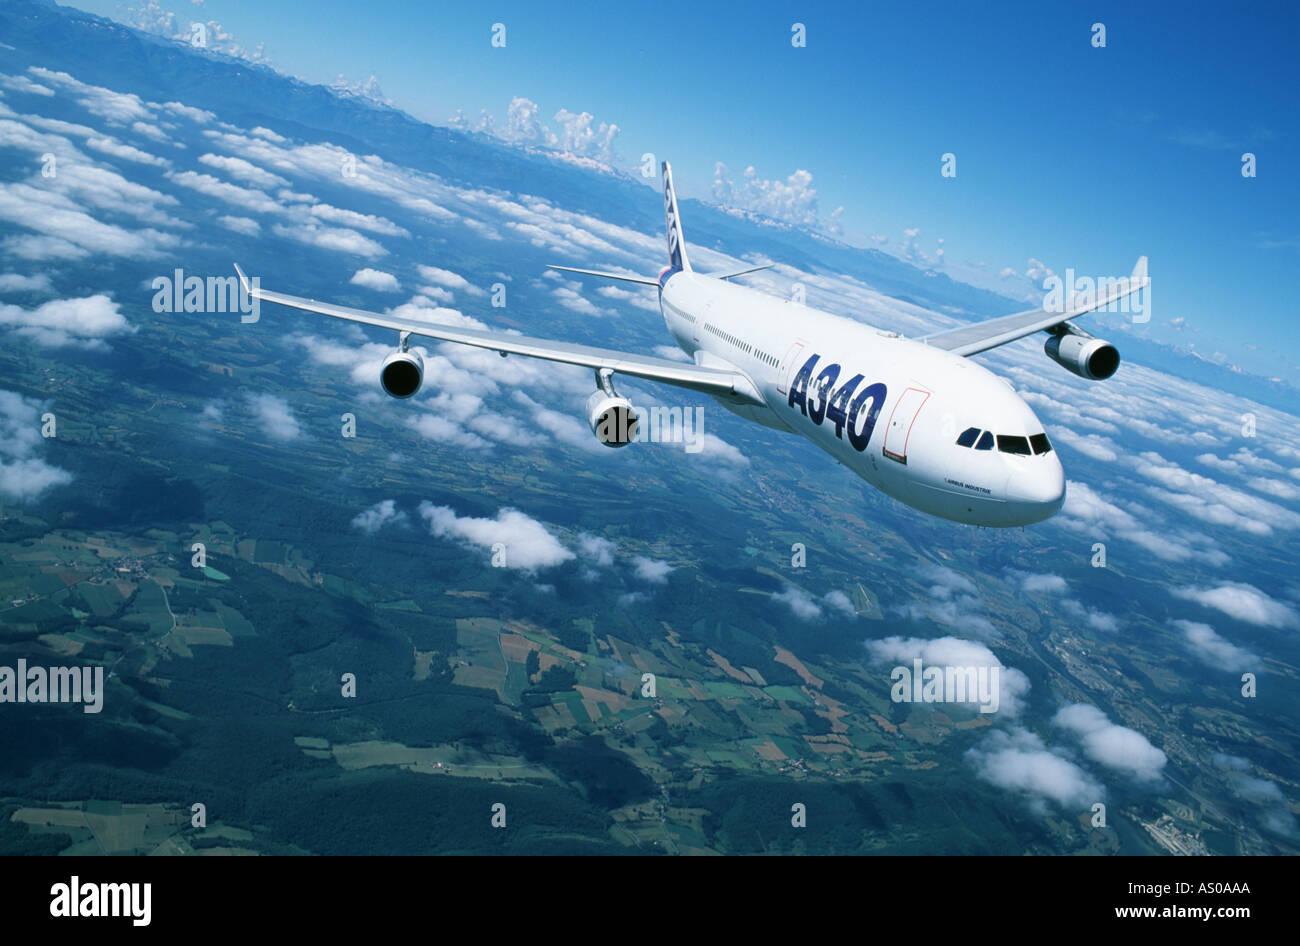 passenger aircraft in flight Airbus A340 passenger aircraft - Stock Image